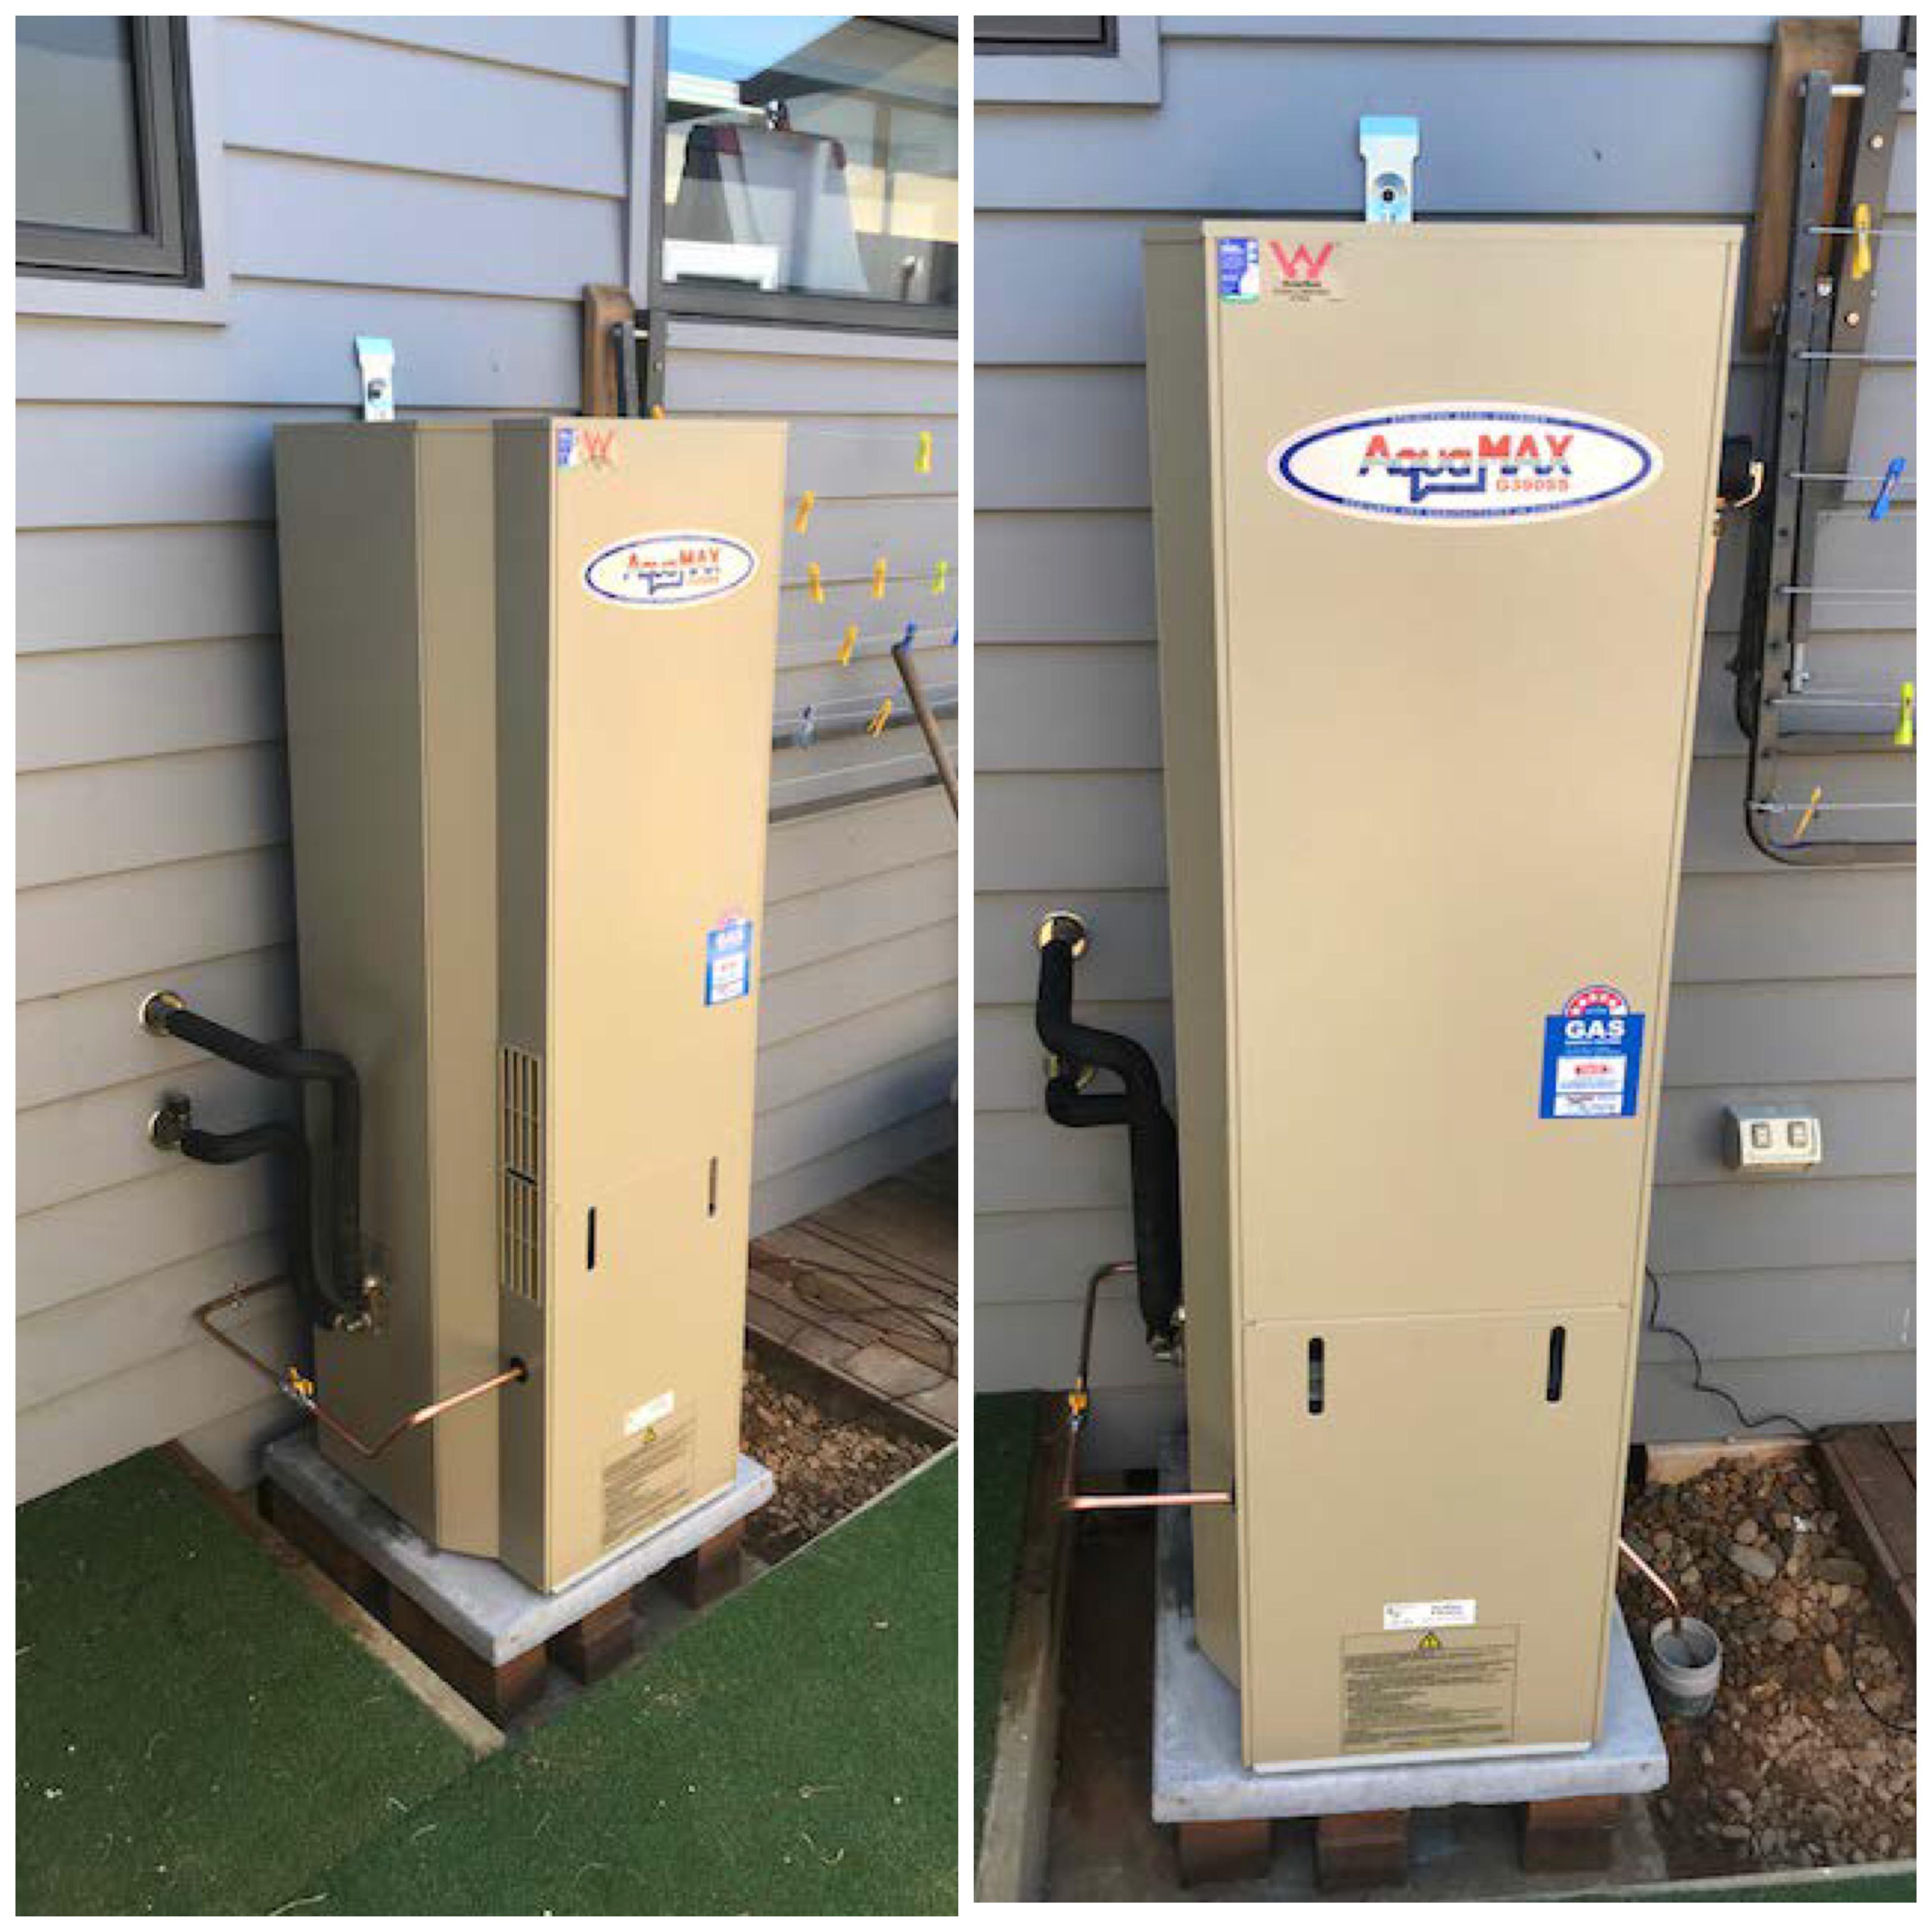 Geelong Hot Water | AquaMAX hot water | Tomlinson Plumbing | Geelong, | Torquay | Barwon Heads | Ocean Grove